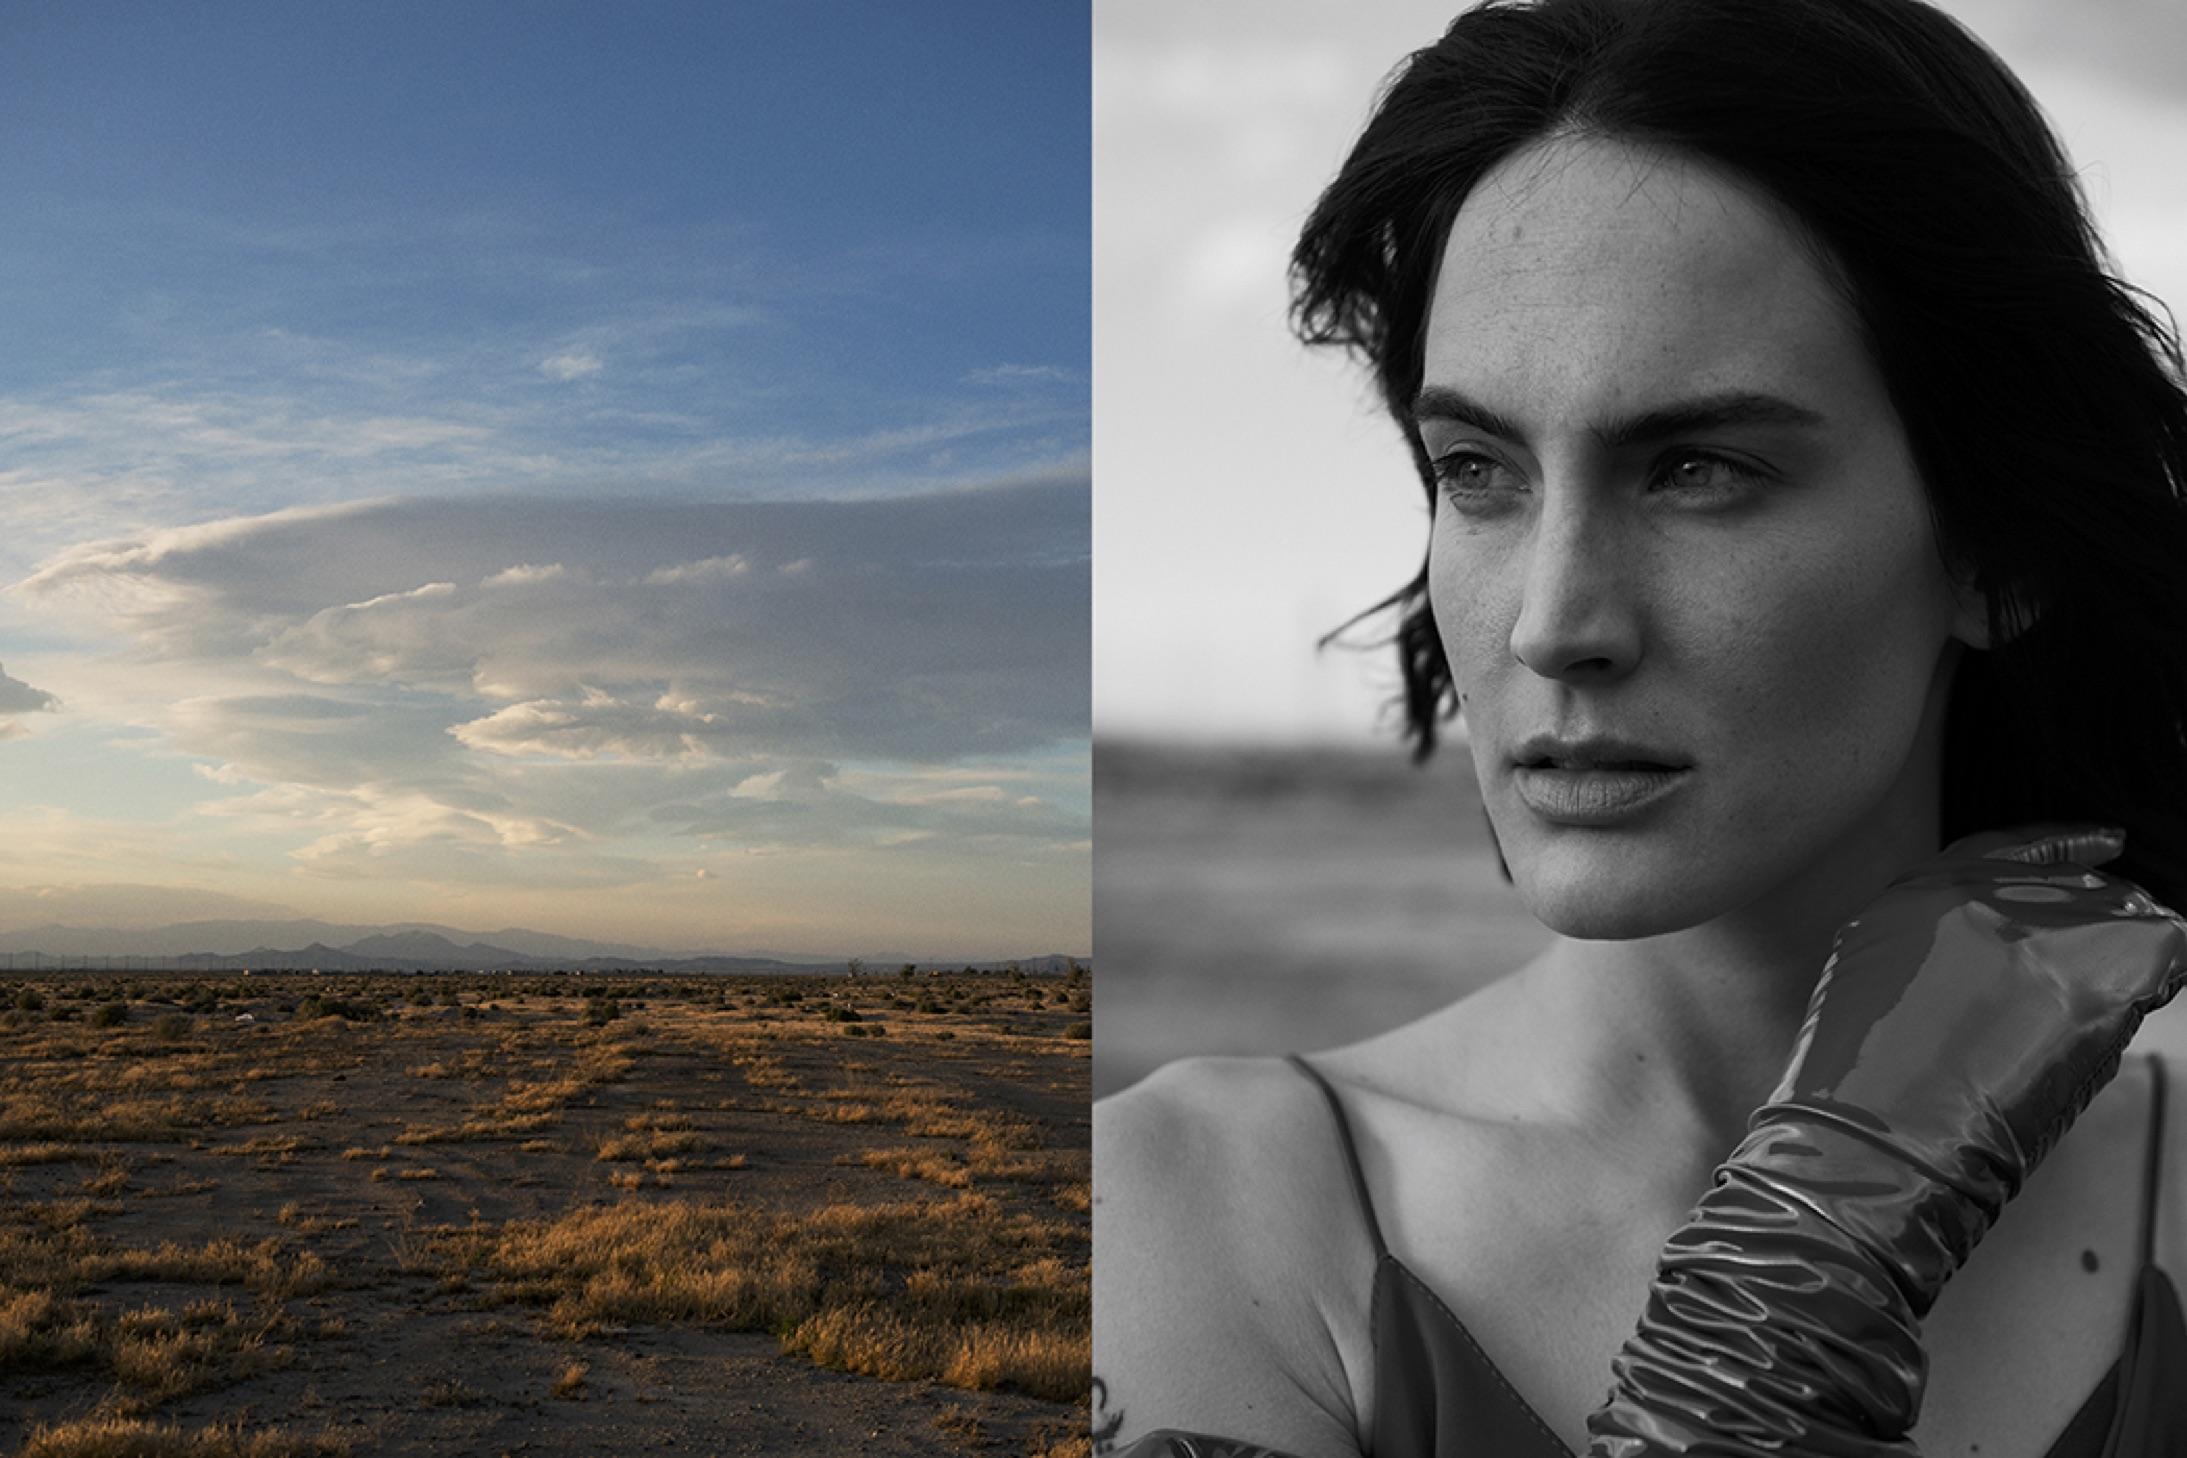 Follow me into the desert.jpg